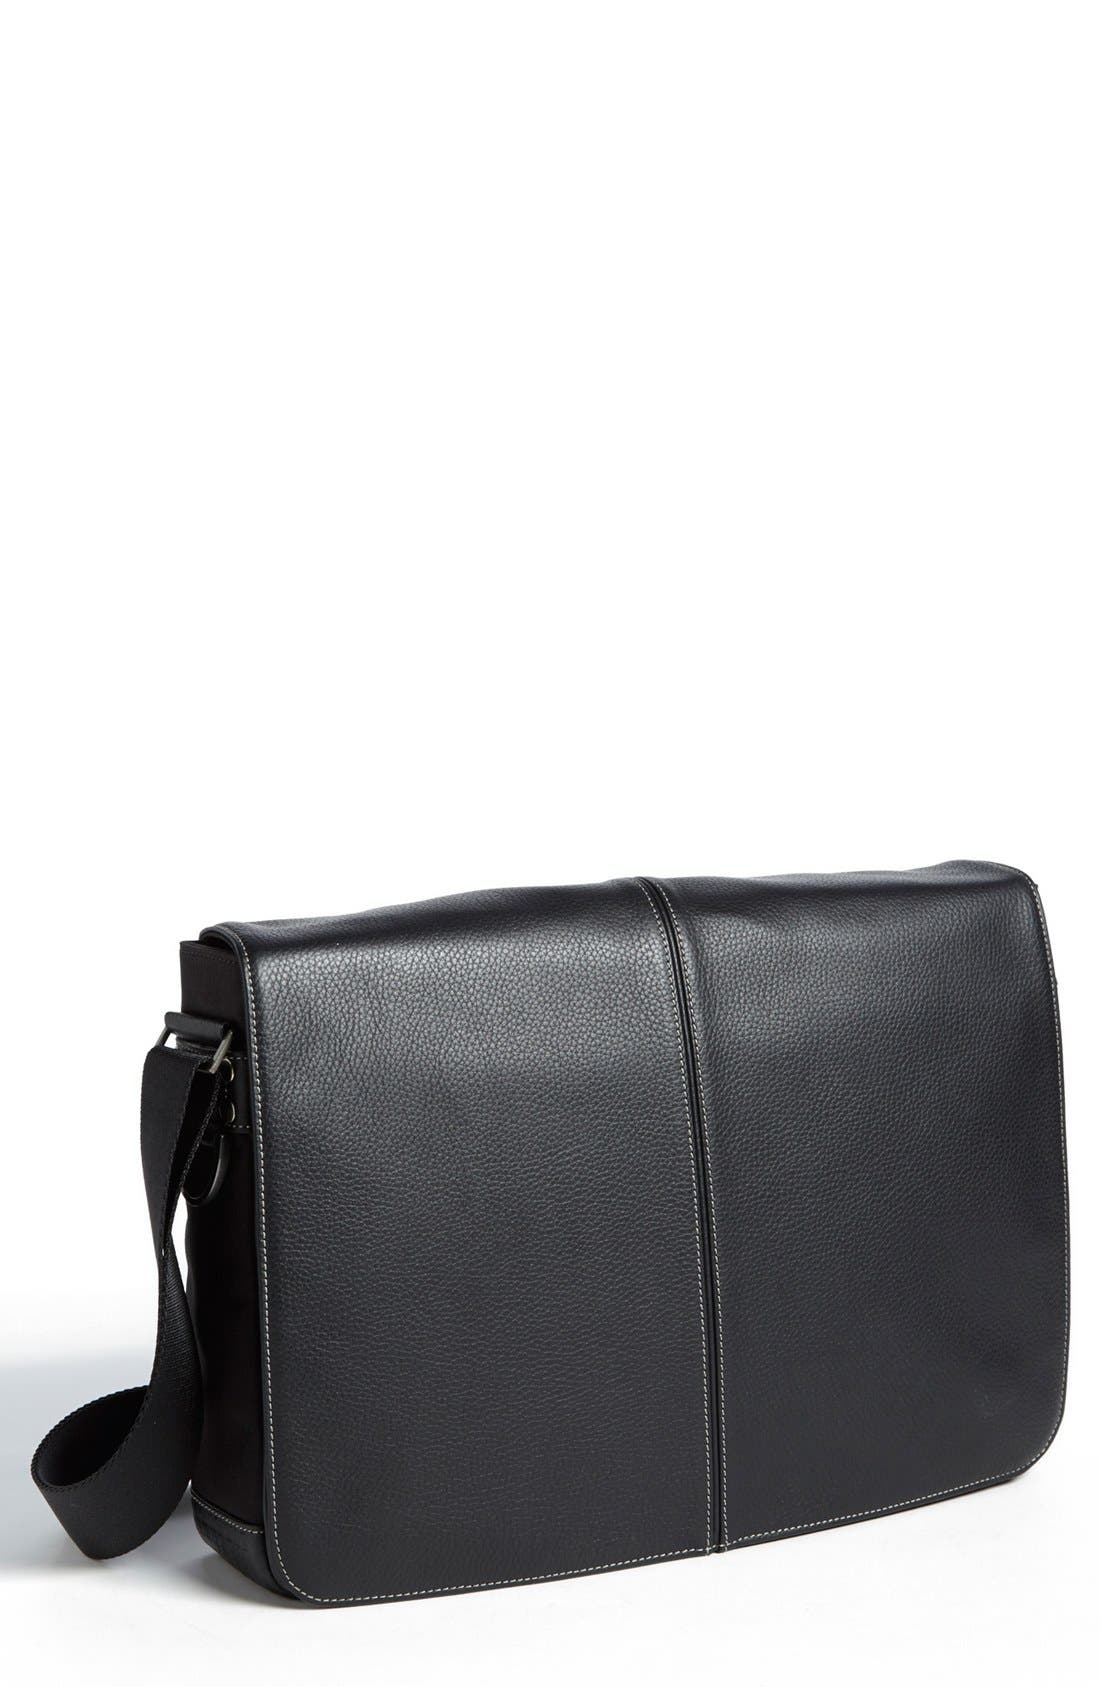 BOCONI, Tyler Slim Leather Laptop Briefcase, Main thumbnail 1, color, BLACK/ KHAKI